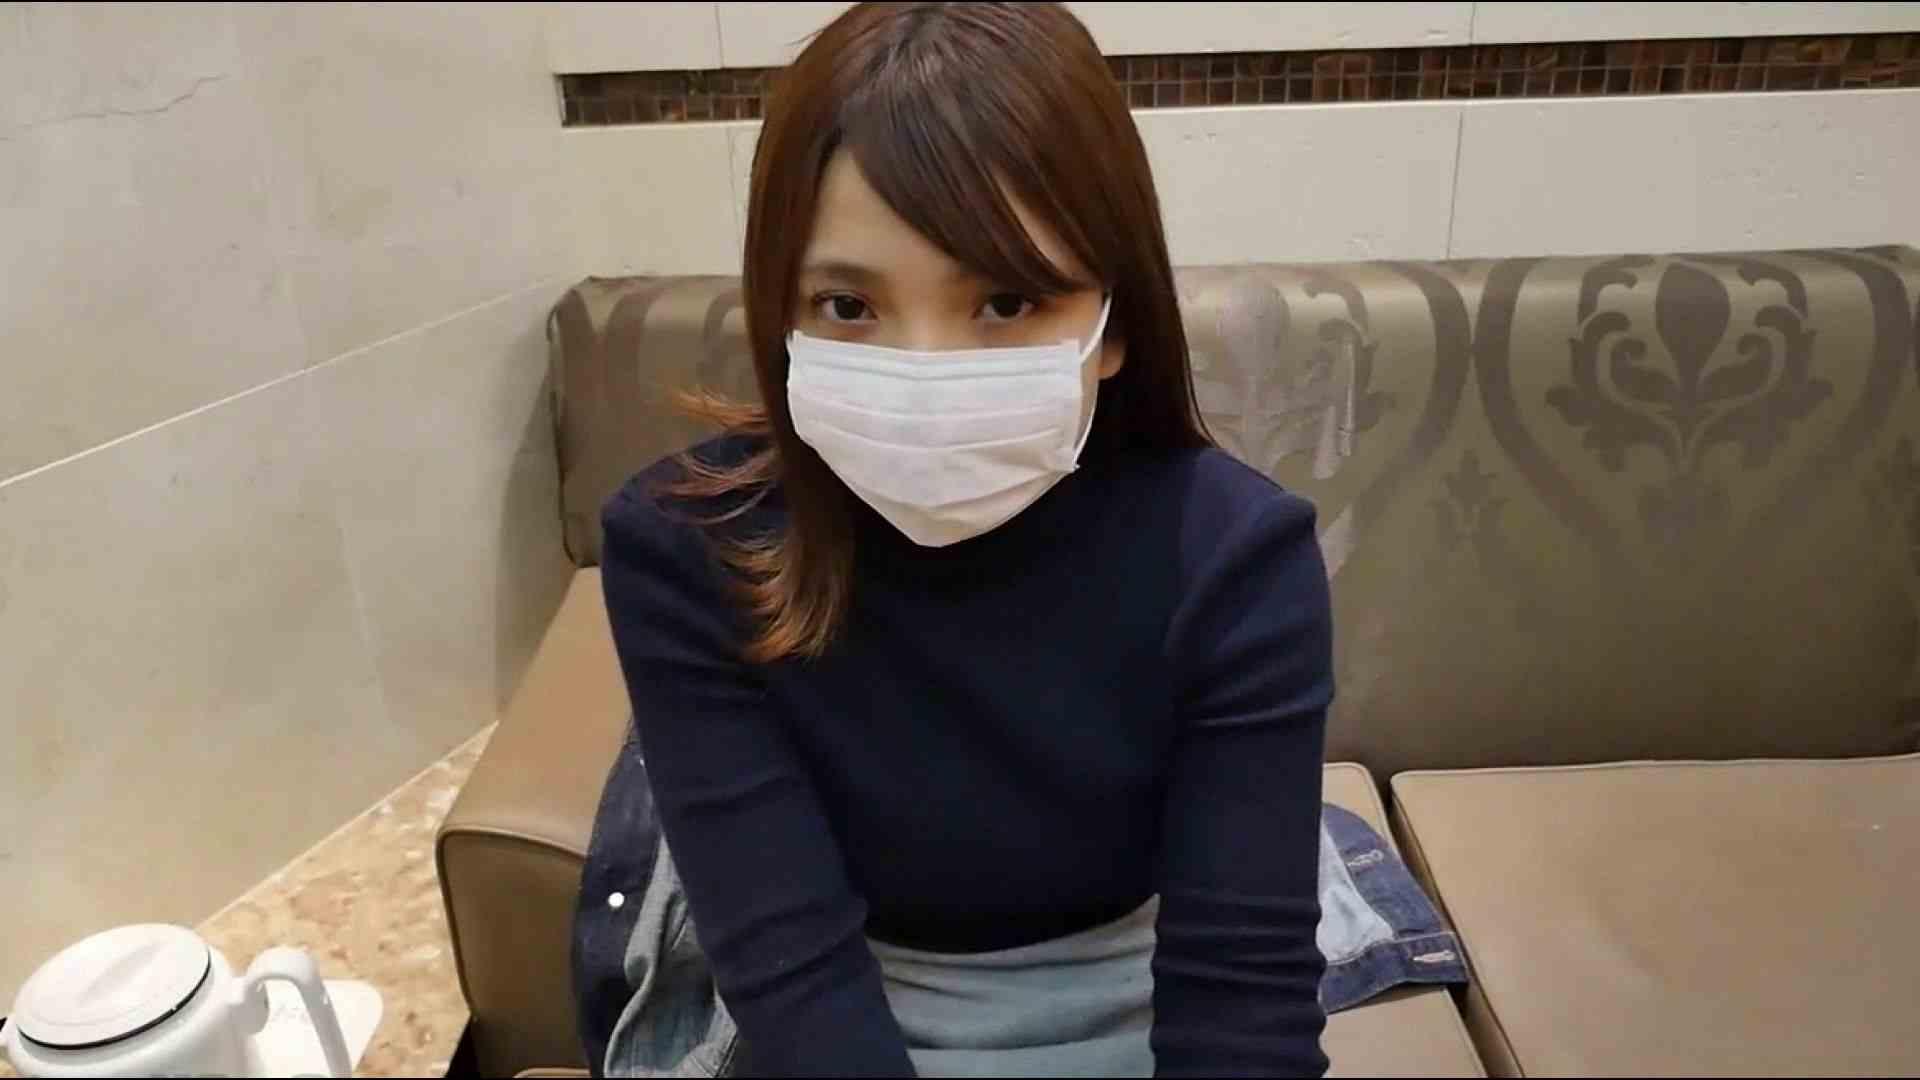 S級厳選美女ビッチガールVol.41 前編 モデル | 美女丸裸  99pic 37